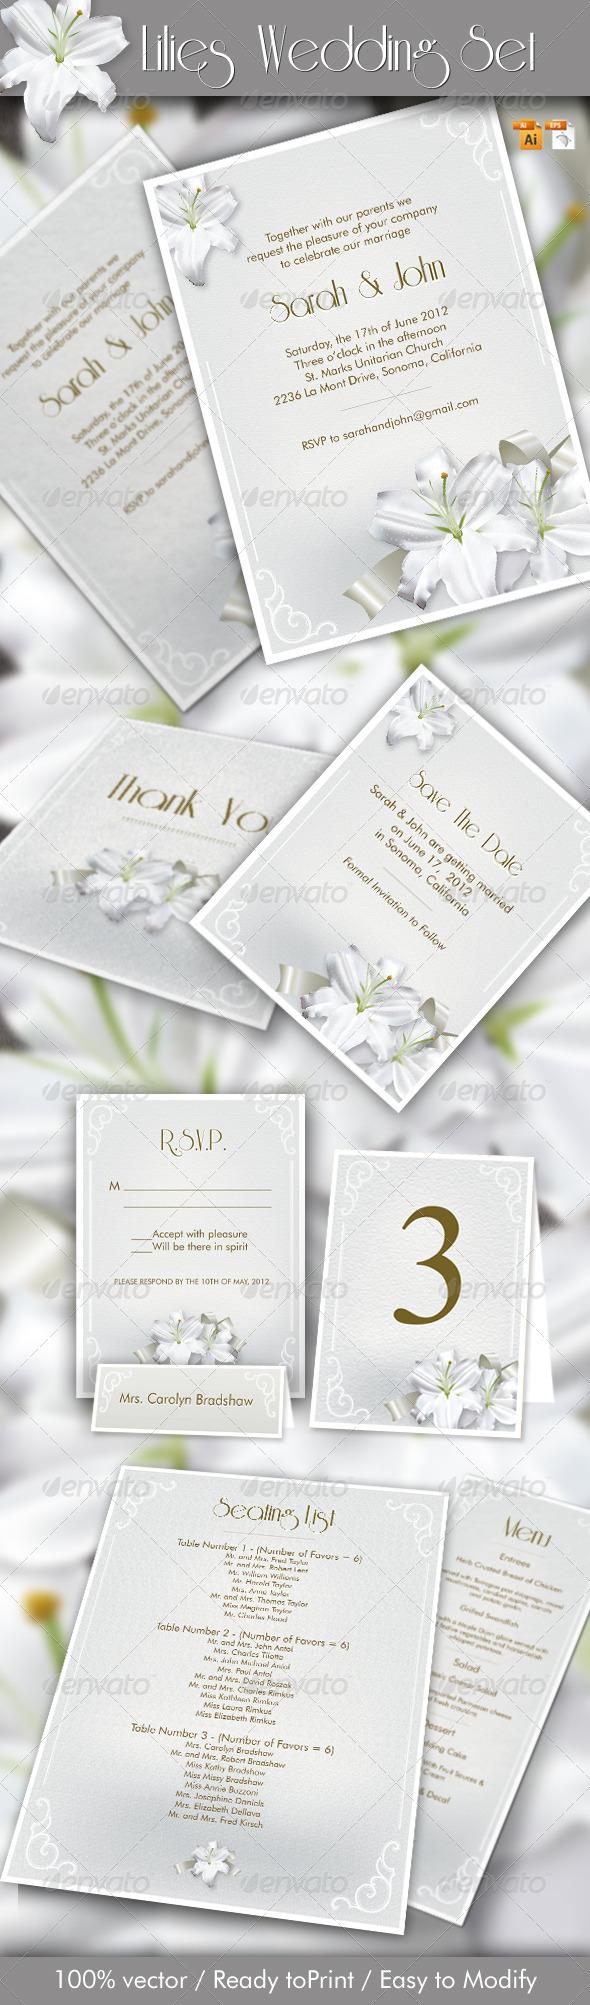 Lilies Wedding Set